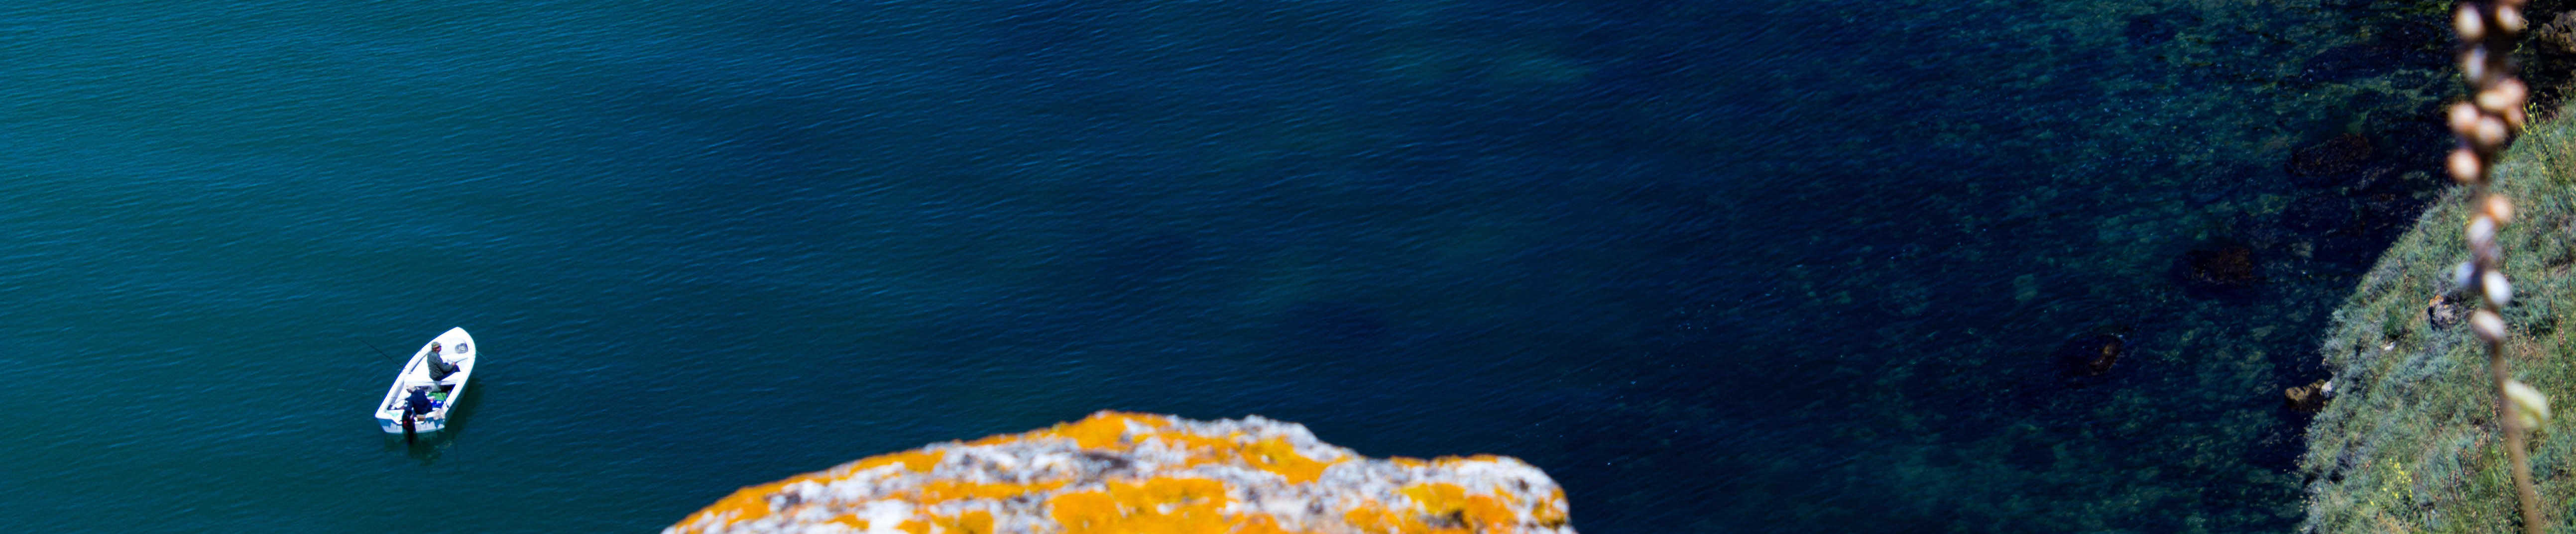 sharemysea la mer